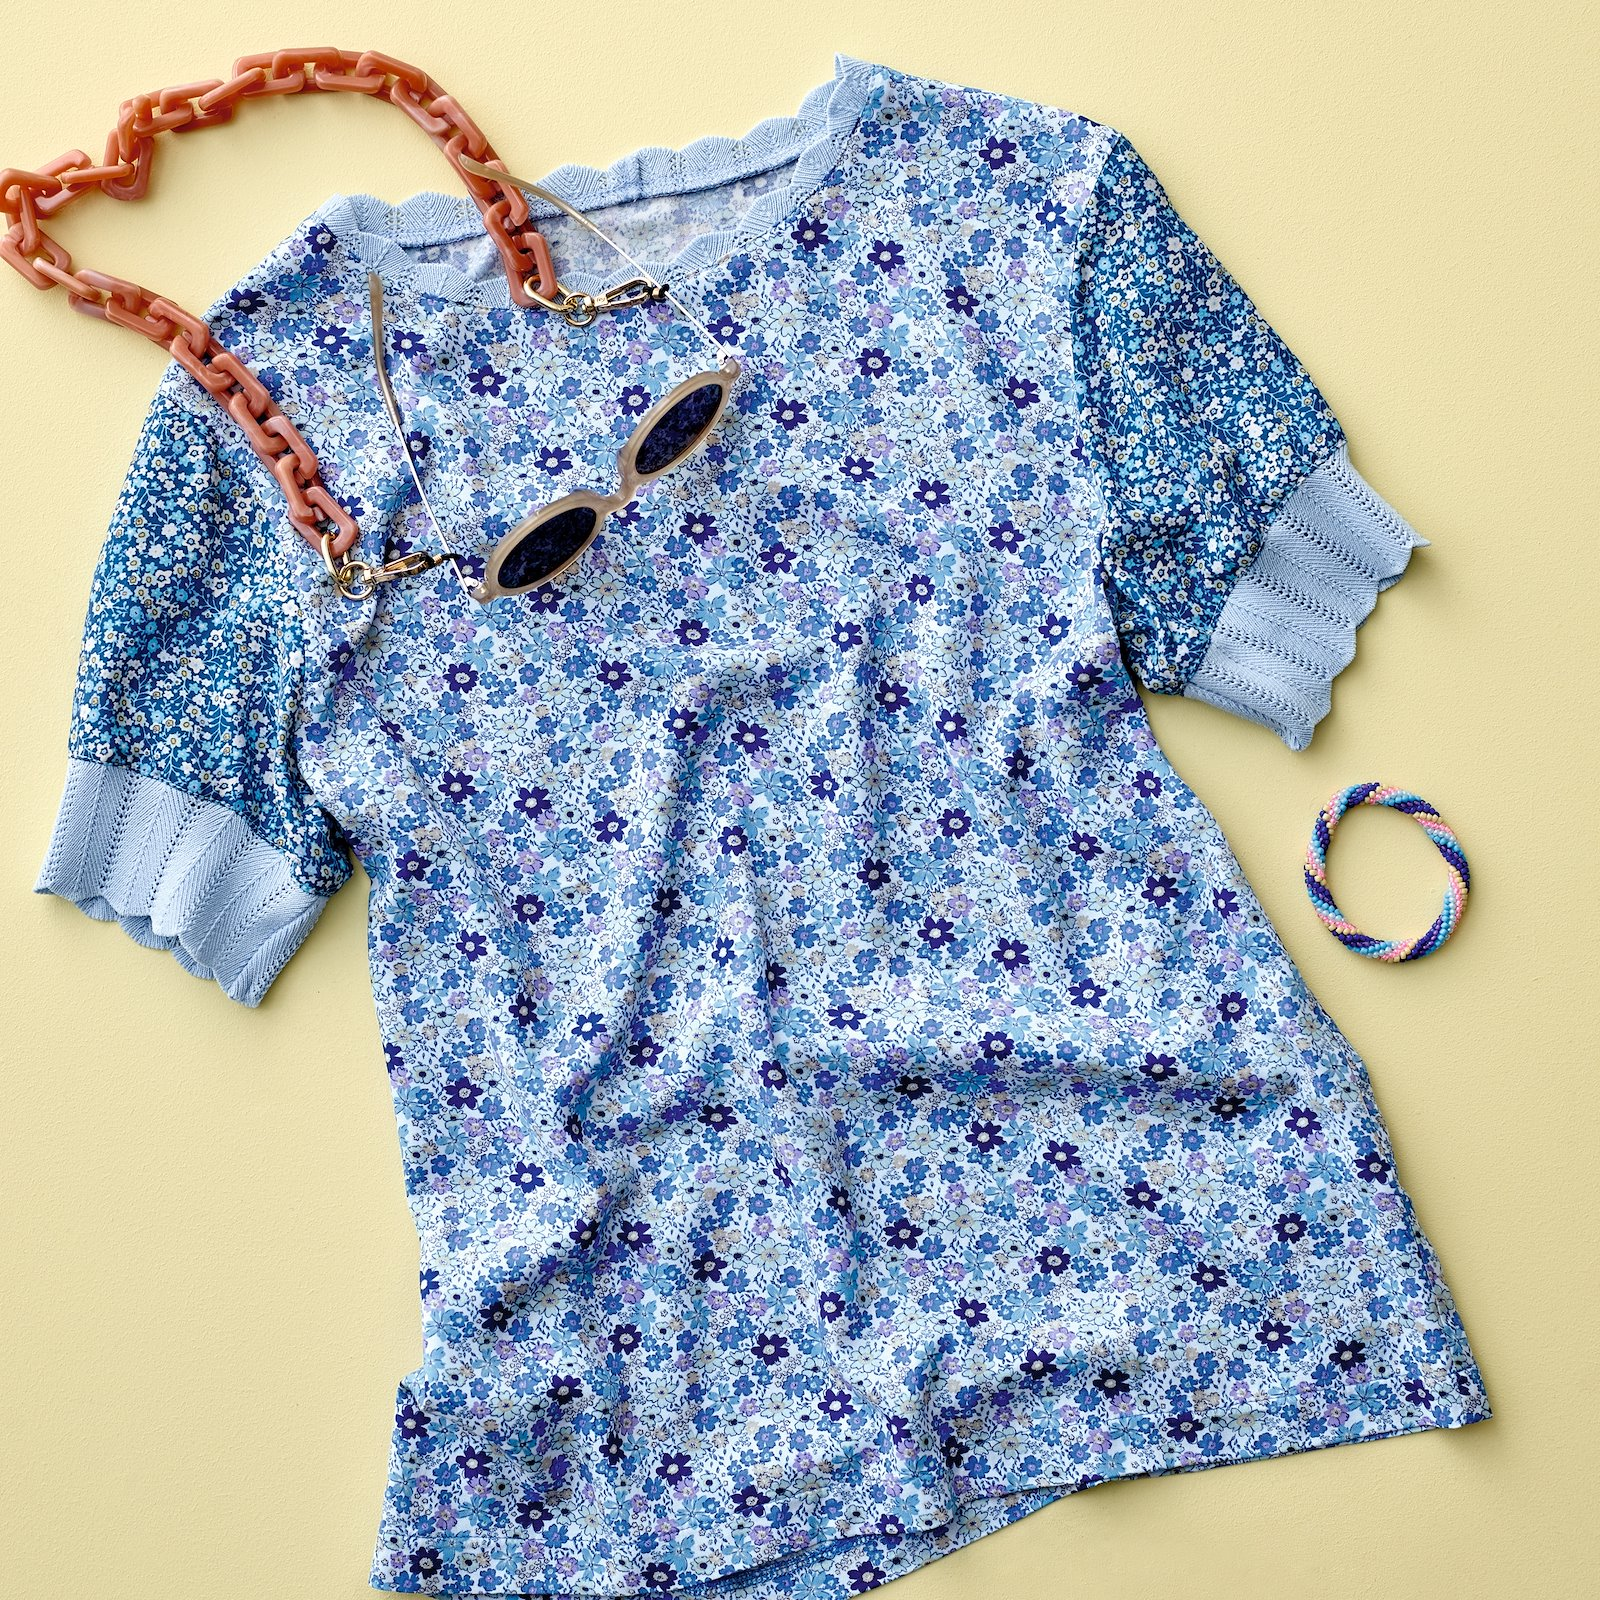 Rib knitted 6x55cm light blue 1pc p22061_710638_710639_96136_46303_bundle